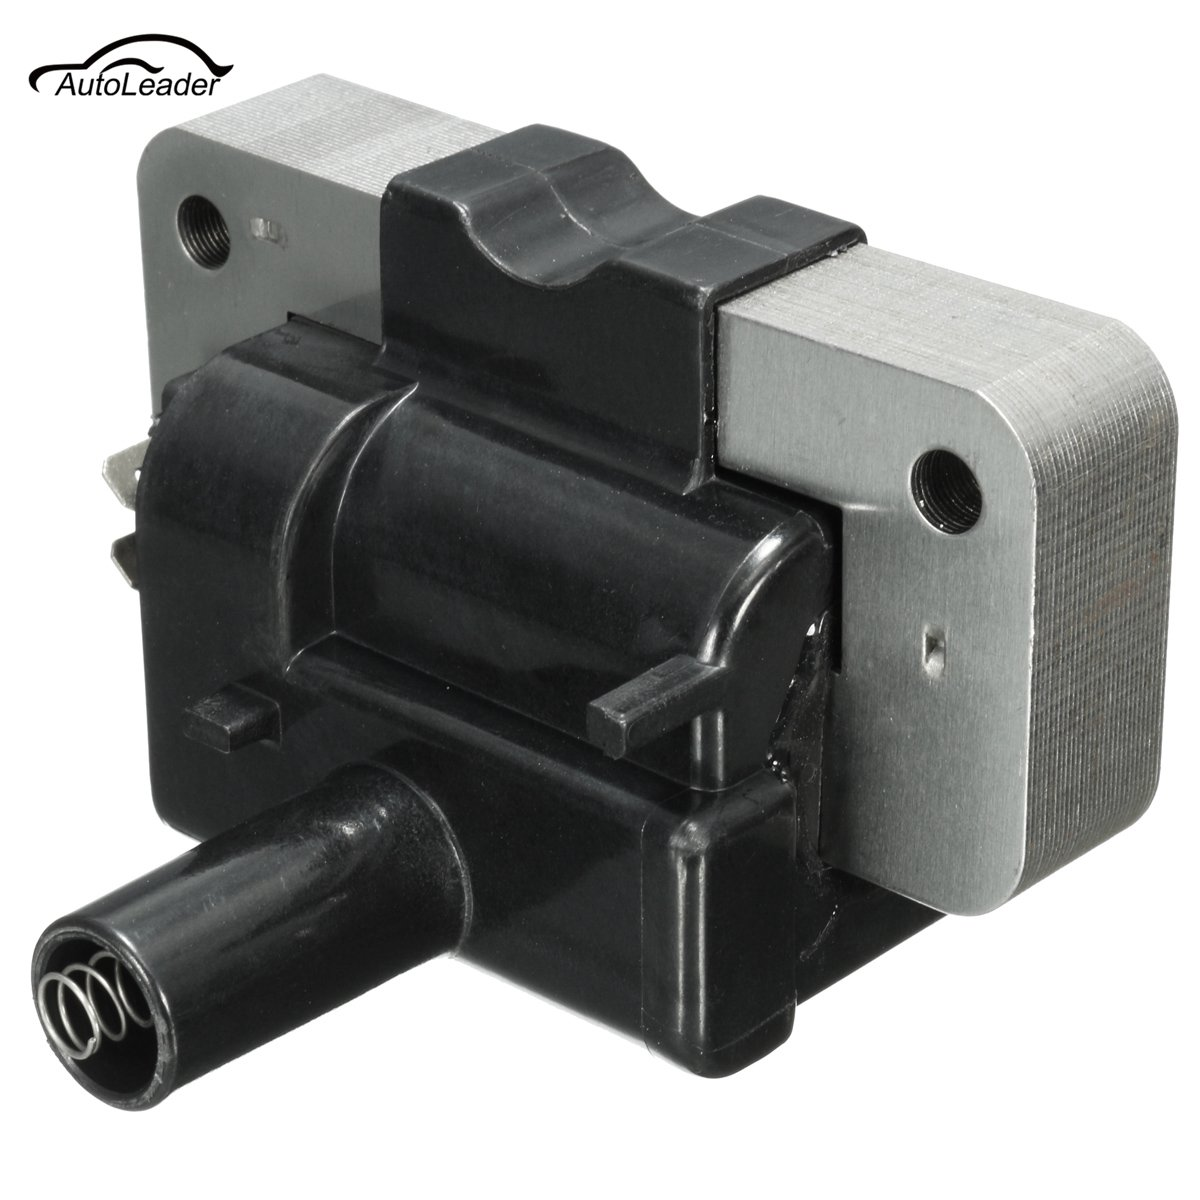 Bobina de encendido para Nissan Pathfinder búsqueda 3.3L motor/Infiniti/Mercurio frontera/Xterra CM1T-230 CM1T-230B